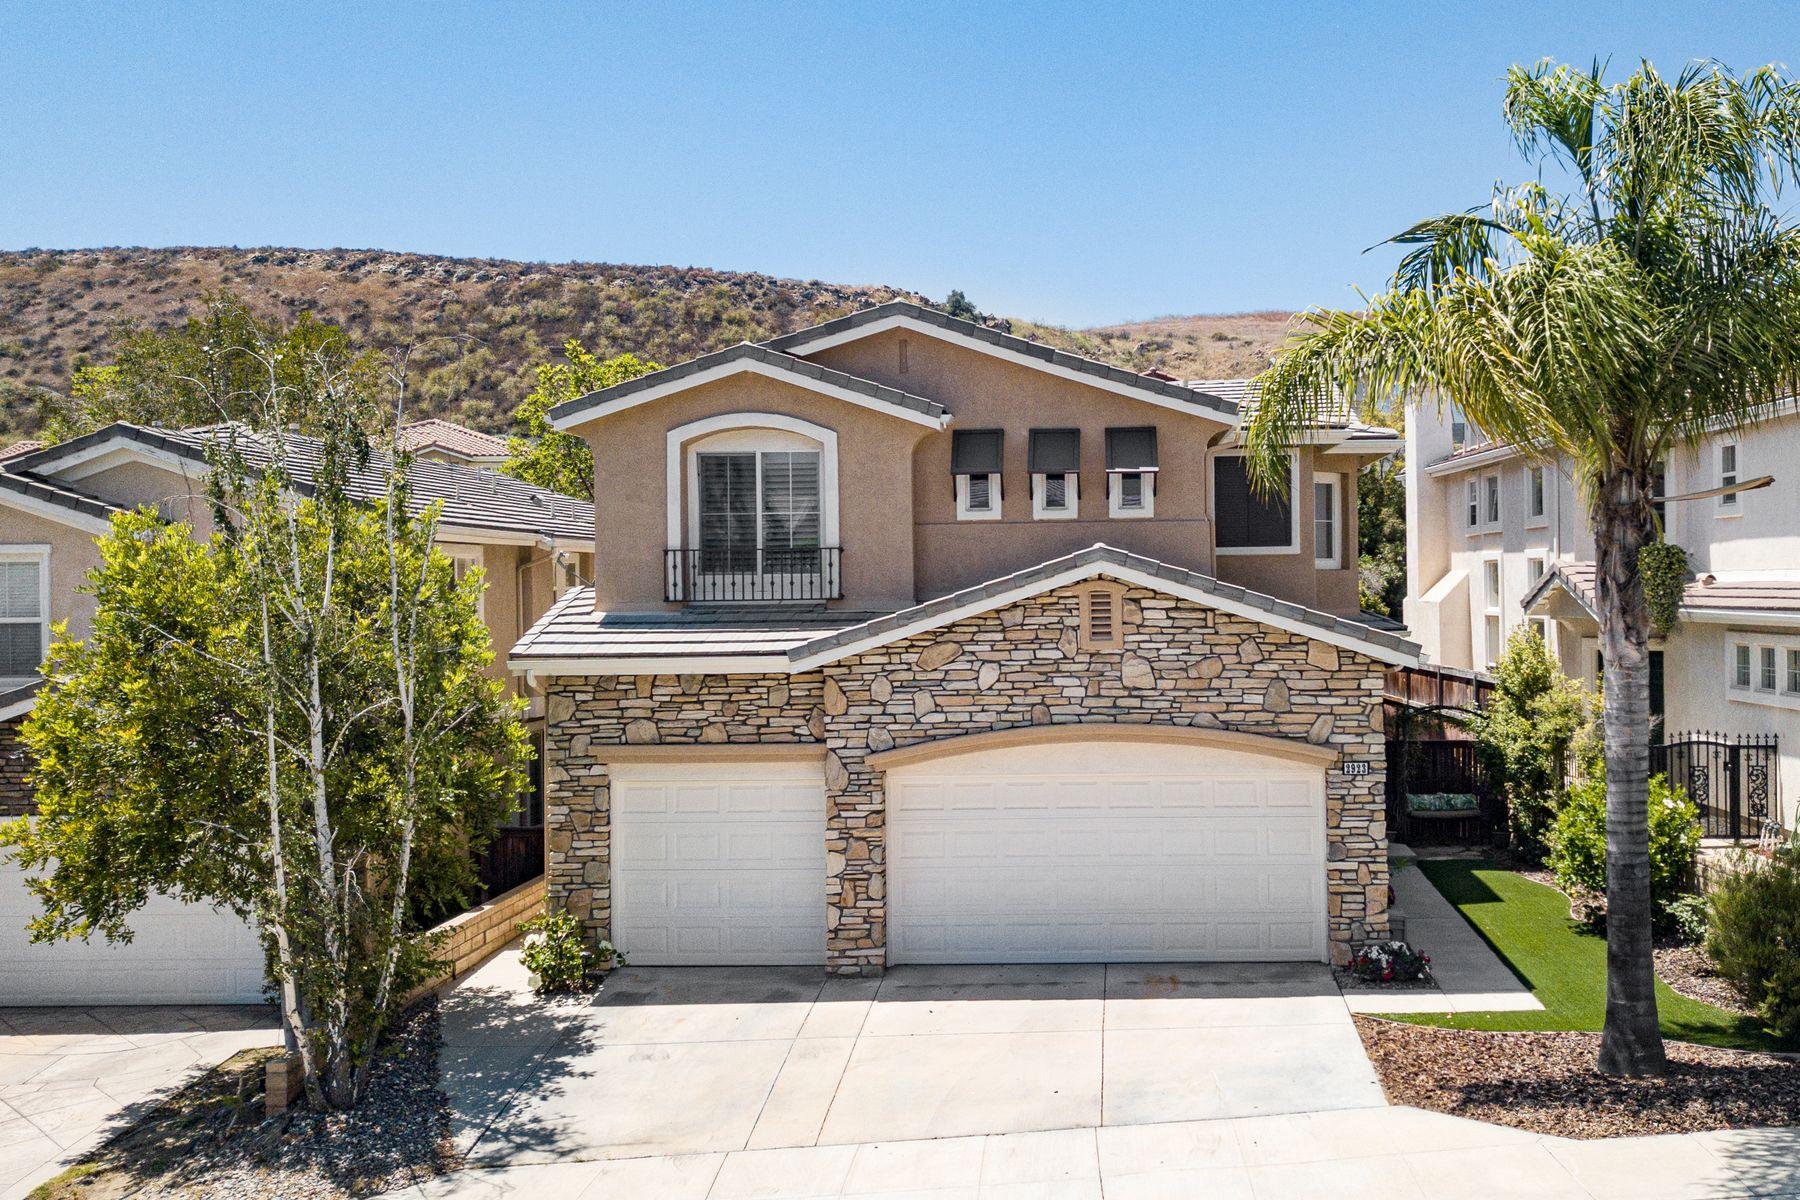 Single Family Homes for Sale at Elegant, Upgraded & Gated Bellagio Home 2923 Arbella Lane Thousand Oaks, California 91362 United States